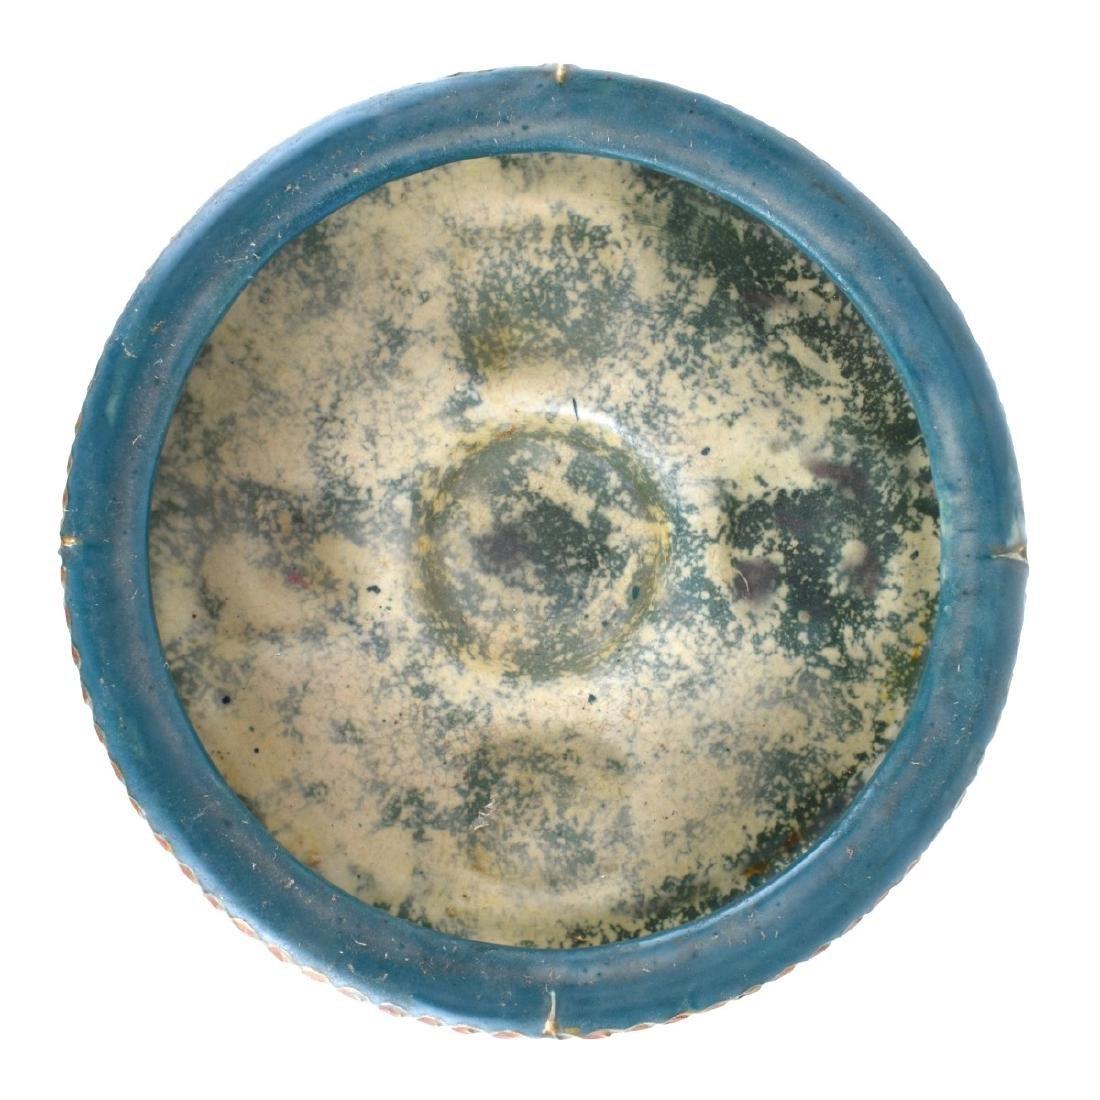 Amphora Turn Teplitz Gres Pottery Compote - 2